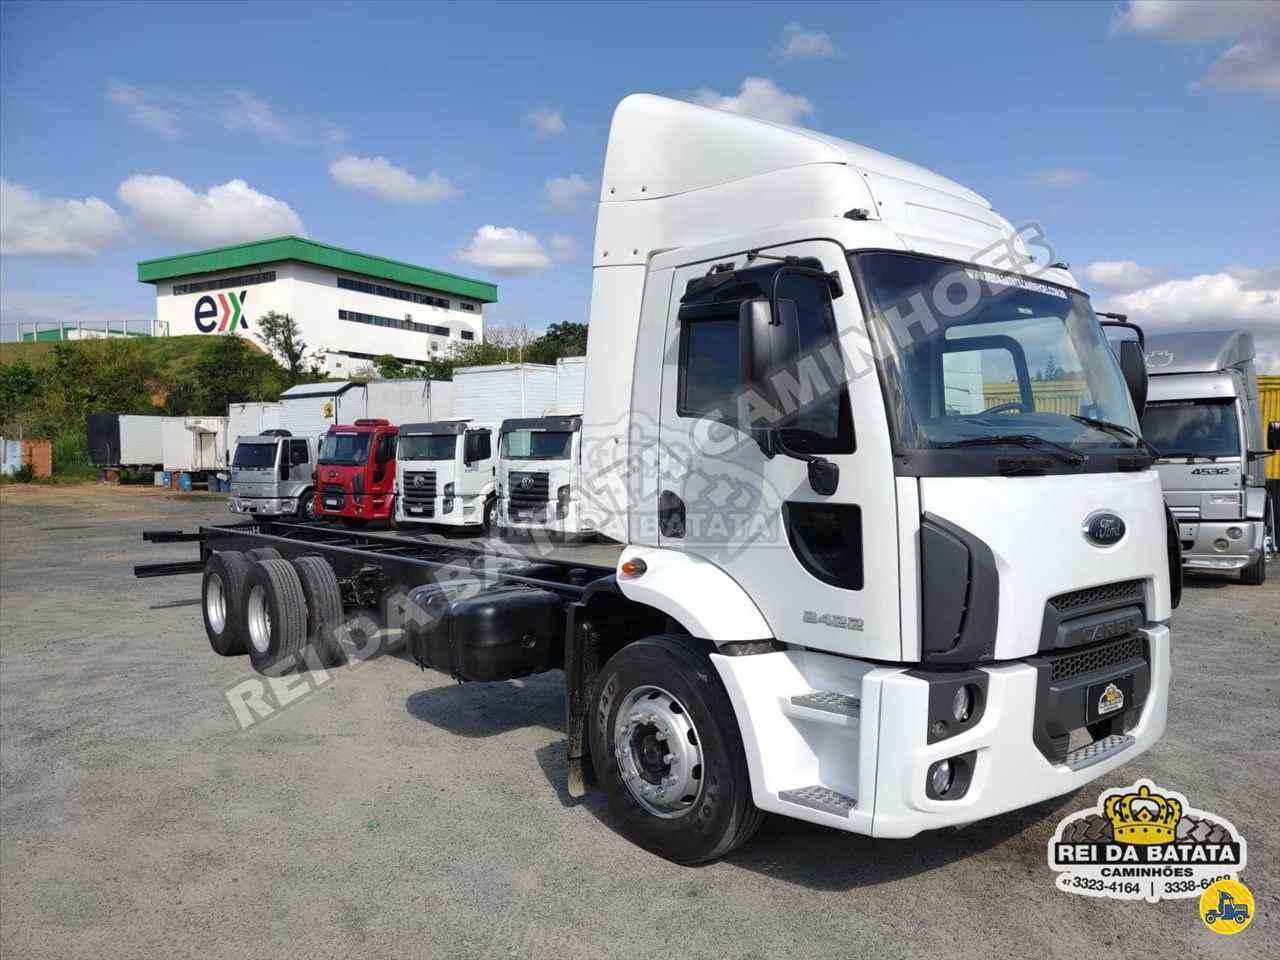 CAMINHAO FORD CARGO 2422 Chassis Truck 6x2 Rei da Batata Caminhões BLUMENAU SANTA CATARINA SC